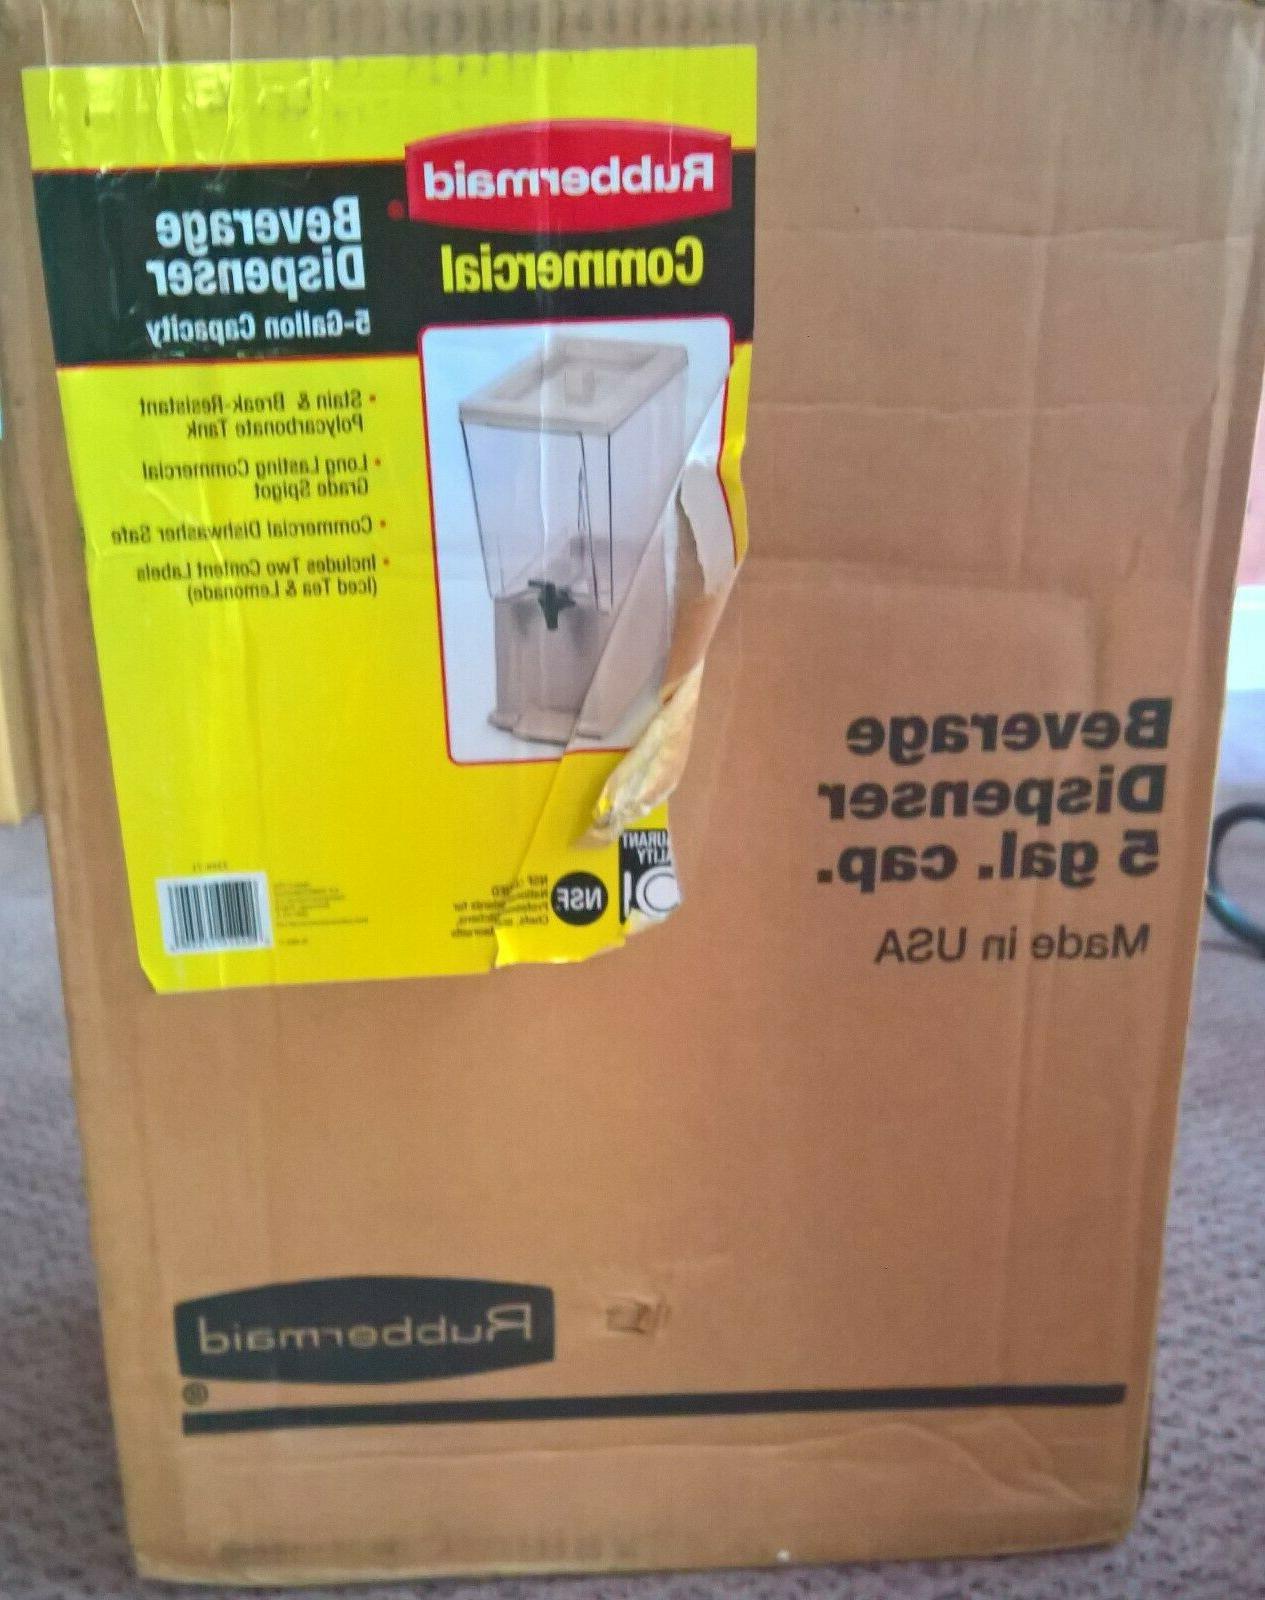 NEW 5 Gallon Commercial Polypropylene Dispenser Made in